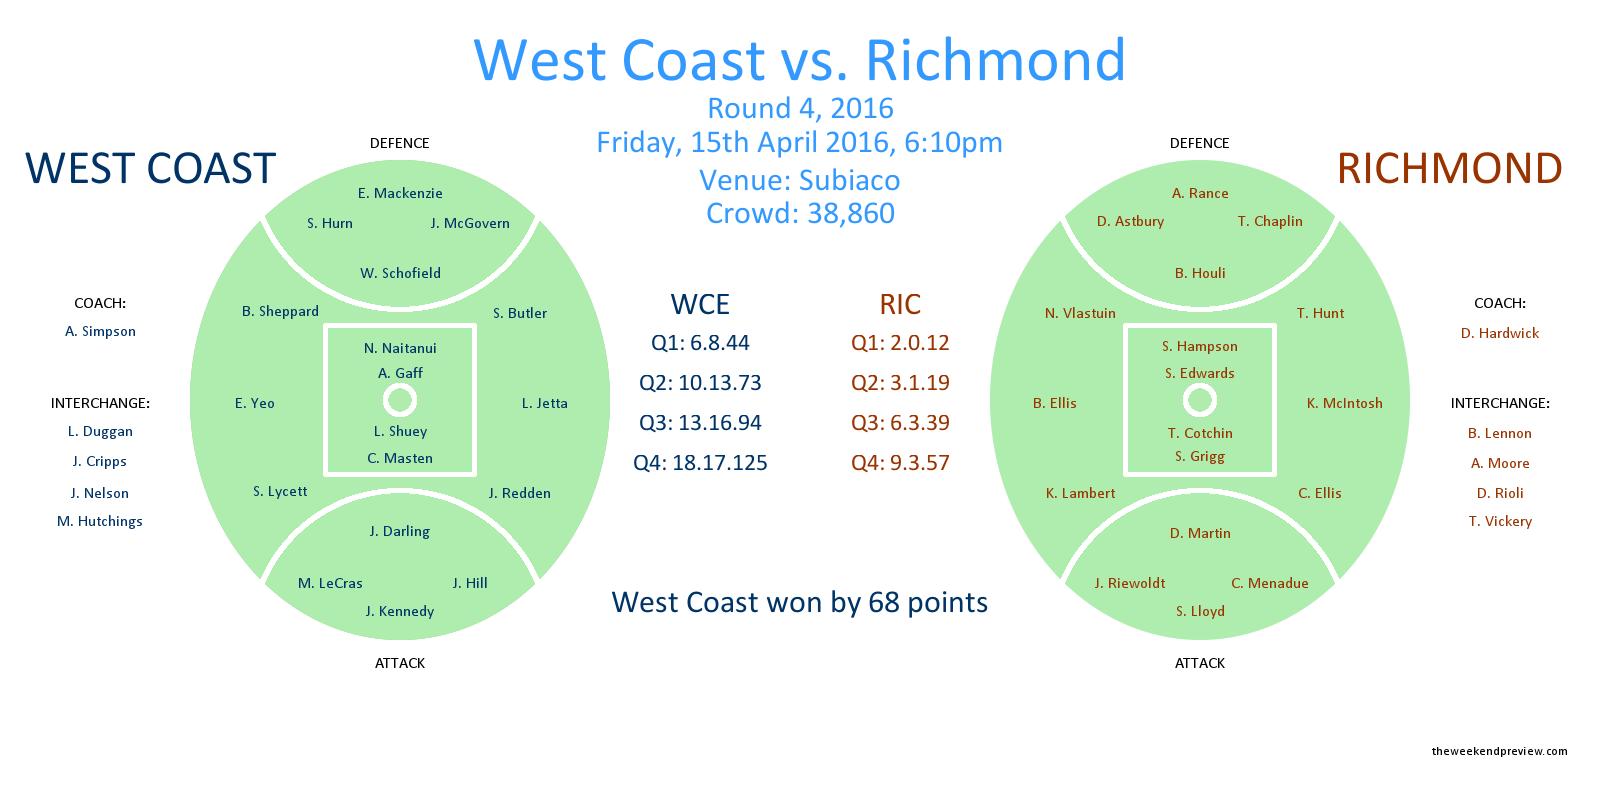 Figure-1: Round 4, 2016 – West Coast vs. Richmond